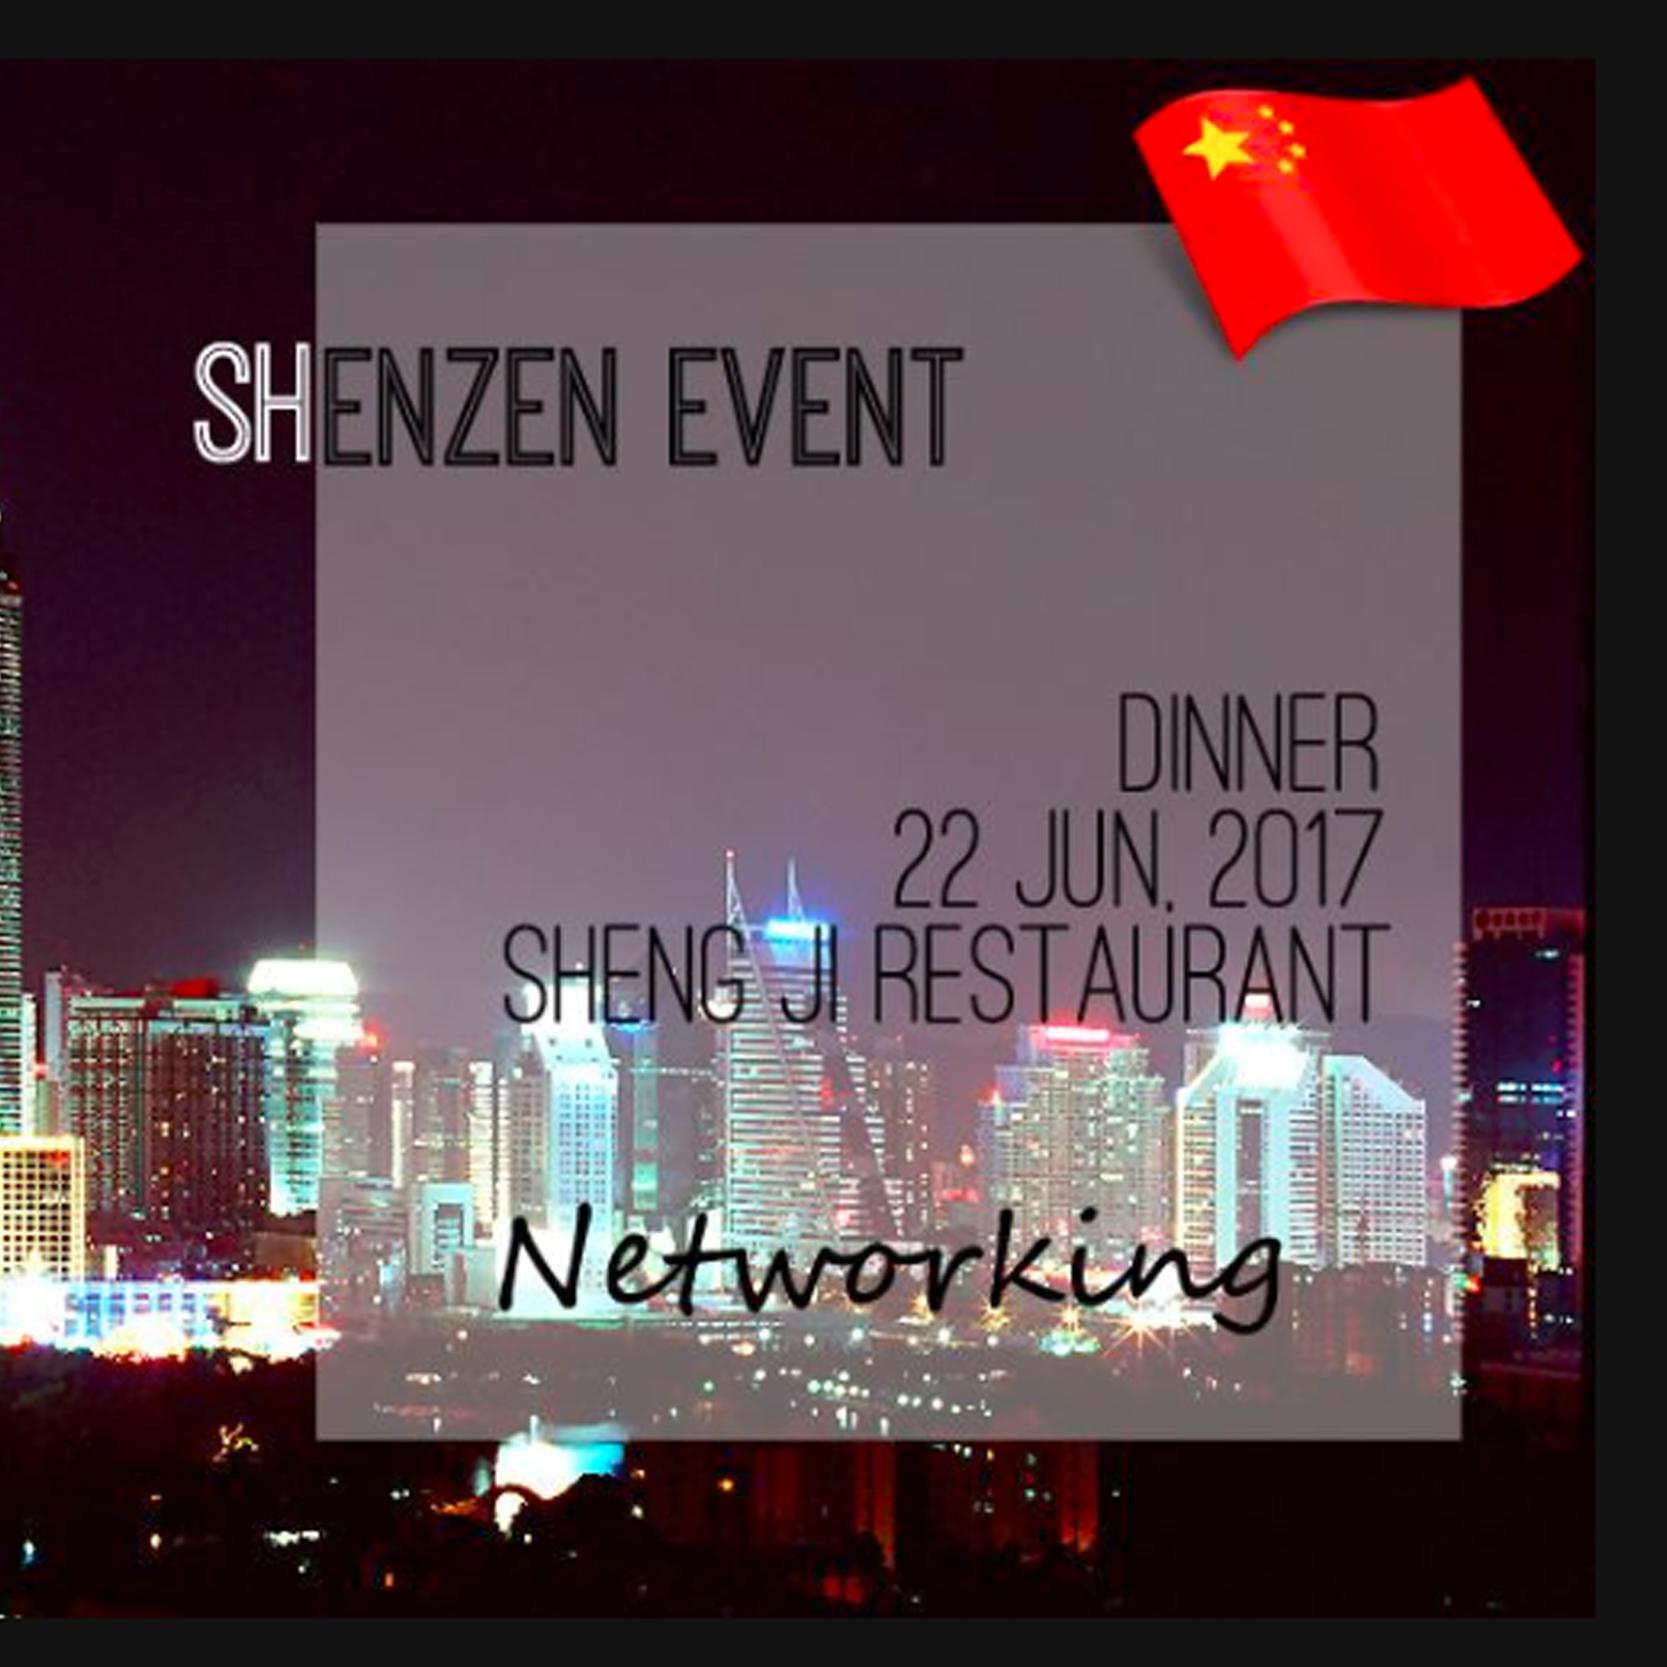 Jun 22 - Shenzhen Gathering Dinner